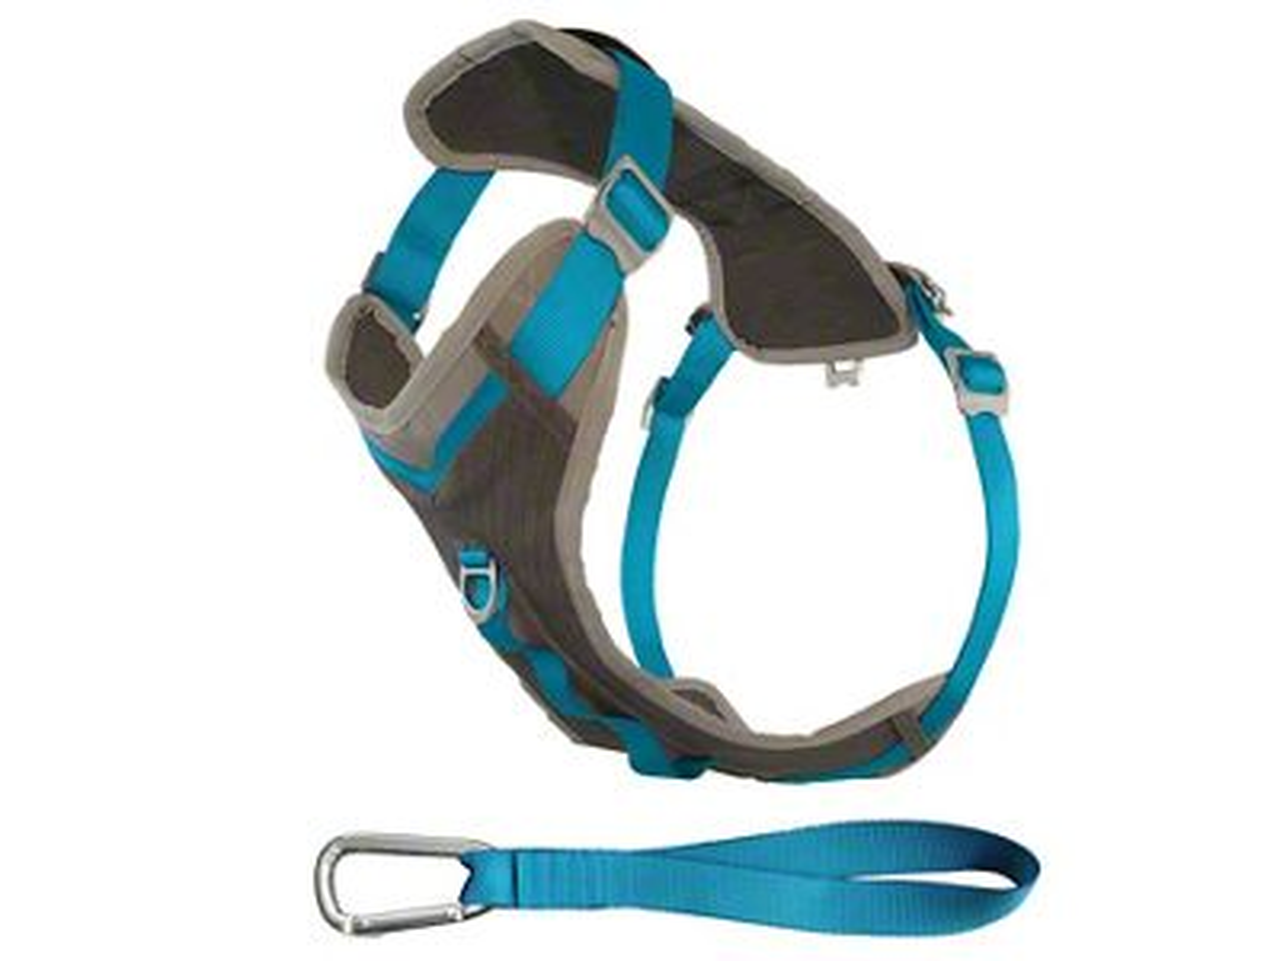 Kurgo Journey Dog Harness - Coastal Blue/Charcoal